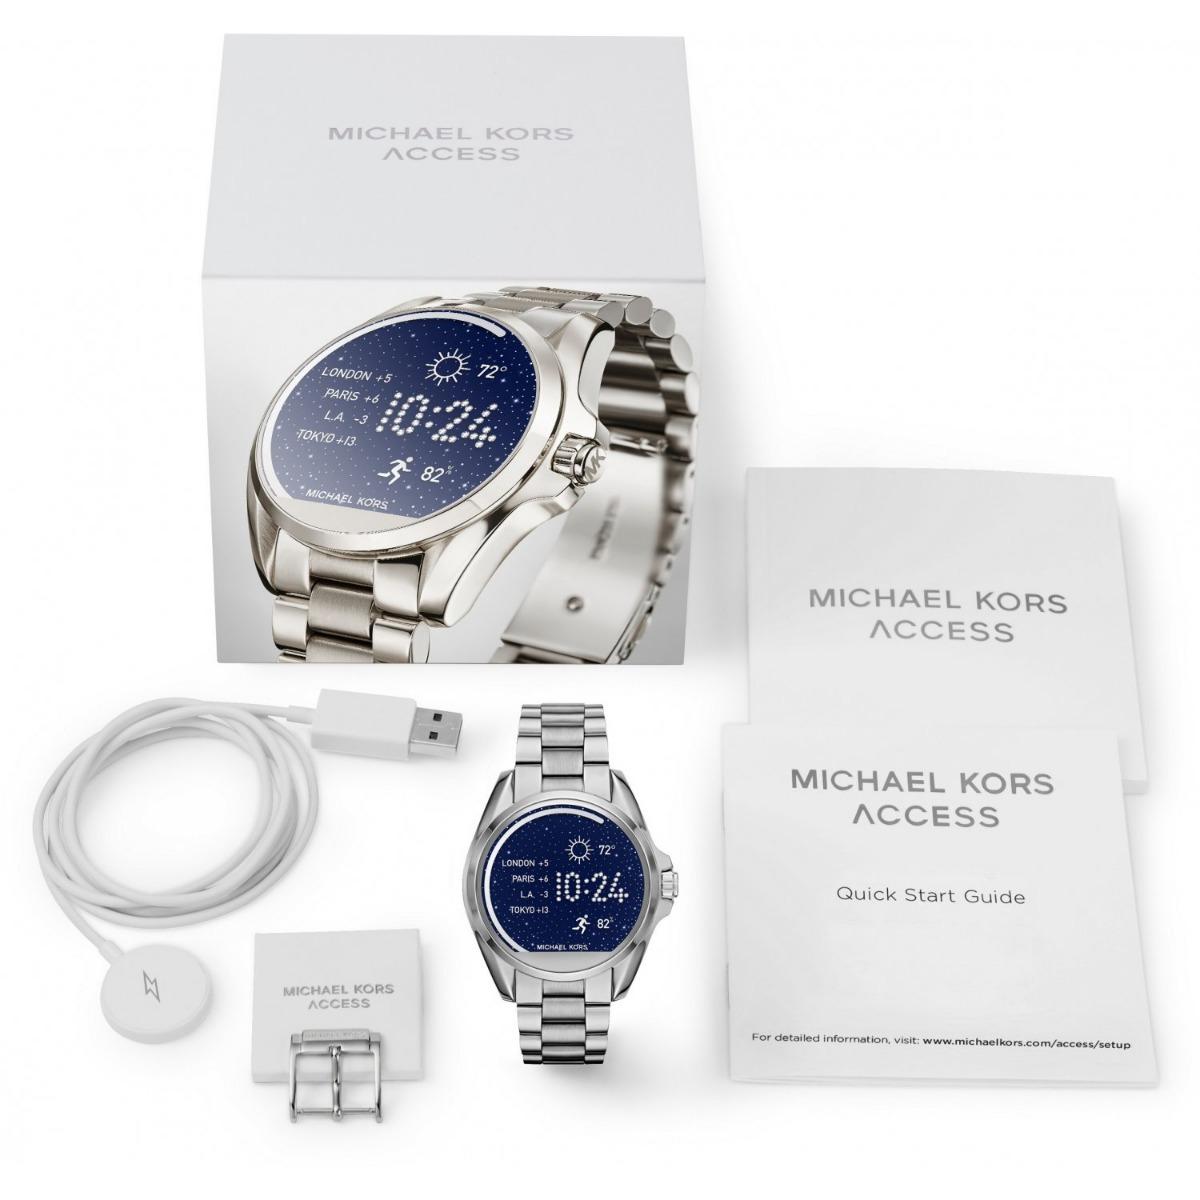 Reloj Bradshaw Michael Kors Access Mkt5012 lFTu1JcK3